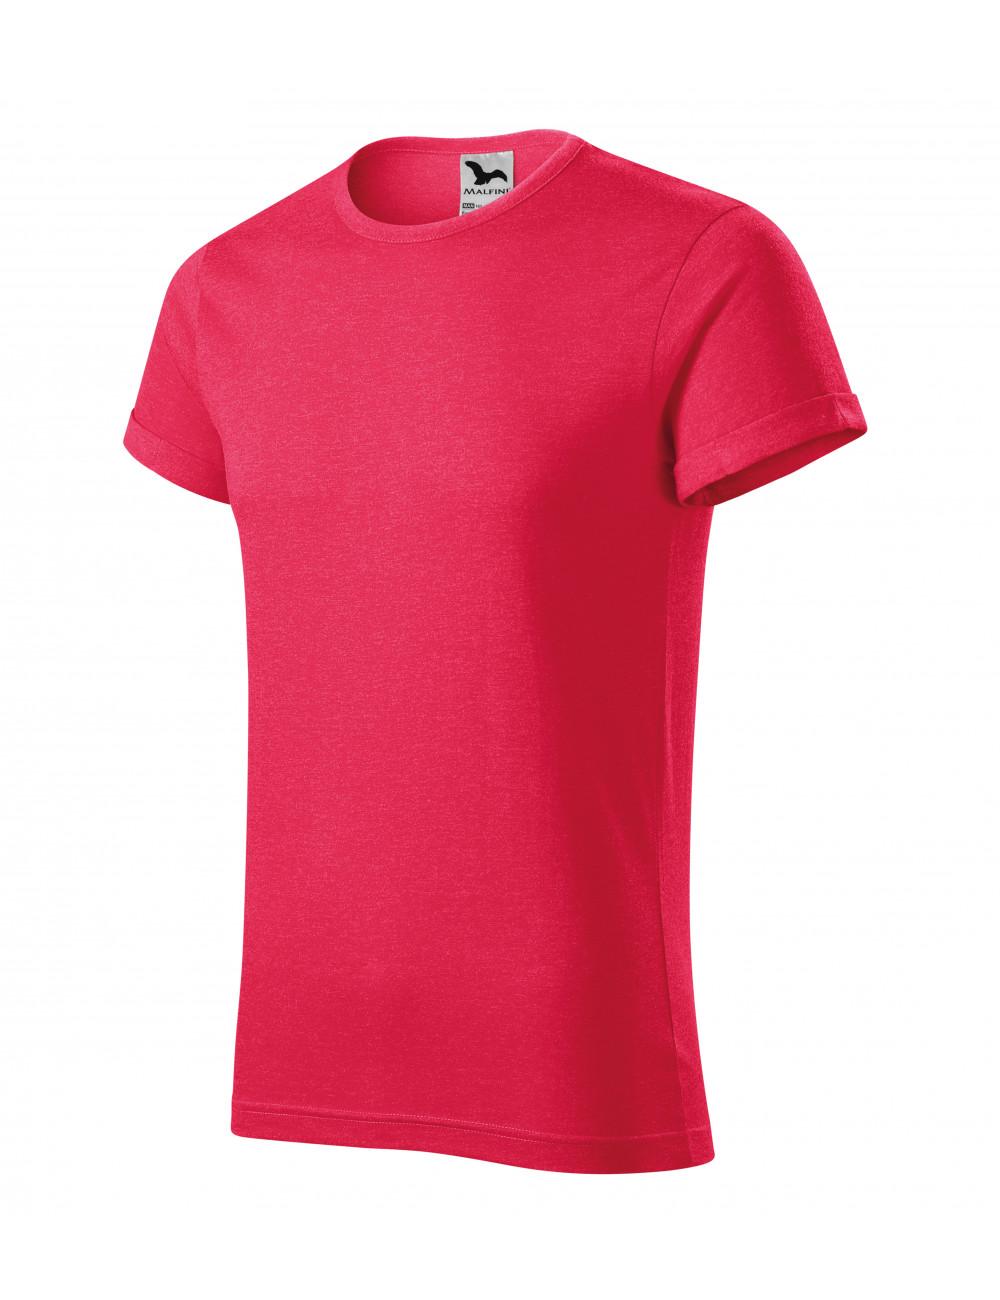 Adler MALFINI Koszulka męska Fusion 163 czerwony melanż